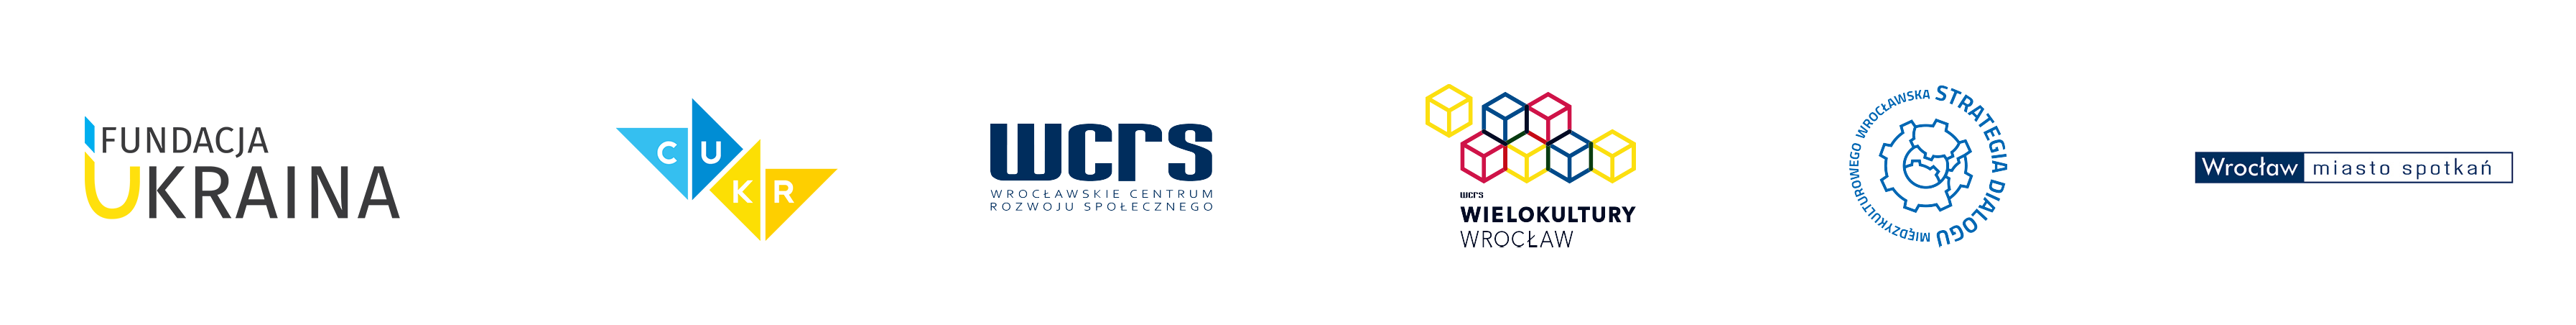 Nowe logo Ruska